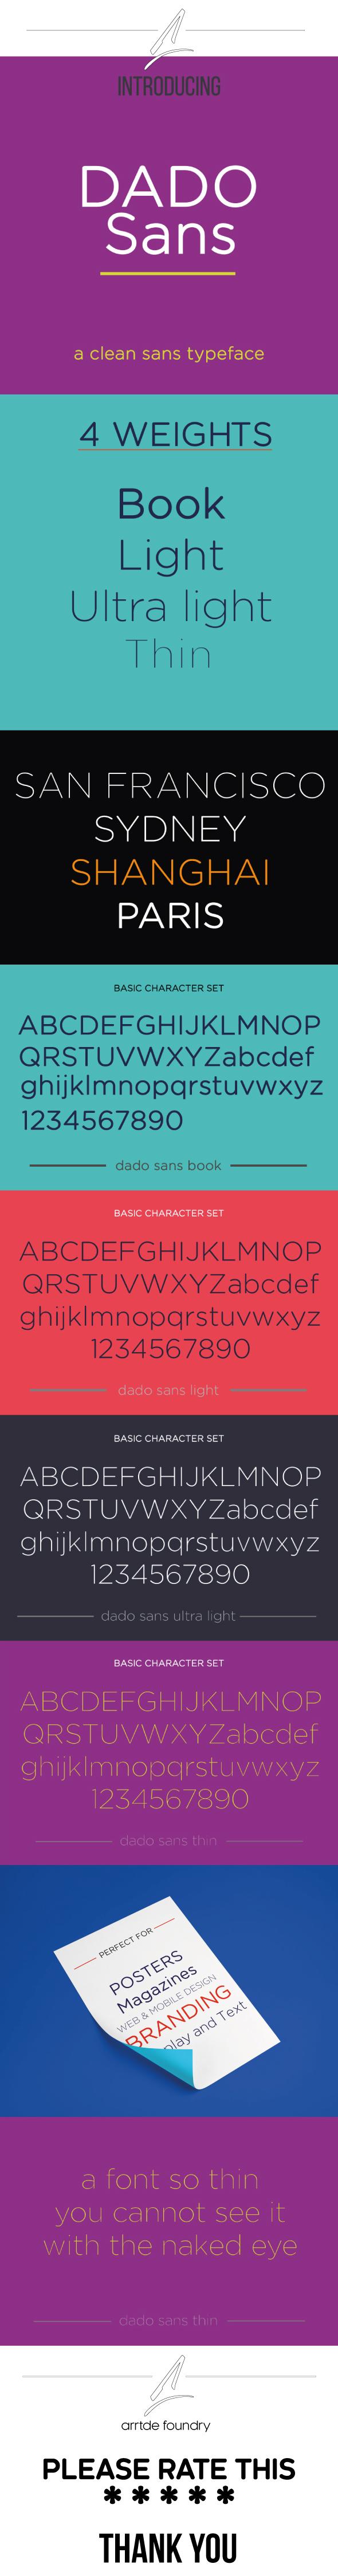 GraphicRiver Dado Sans Typeface 20946094